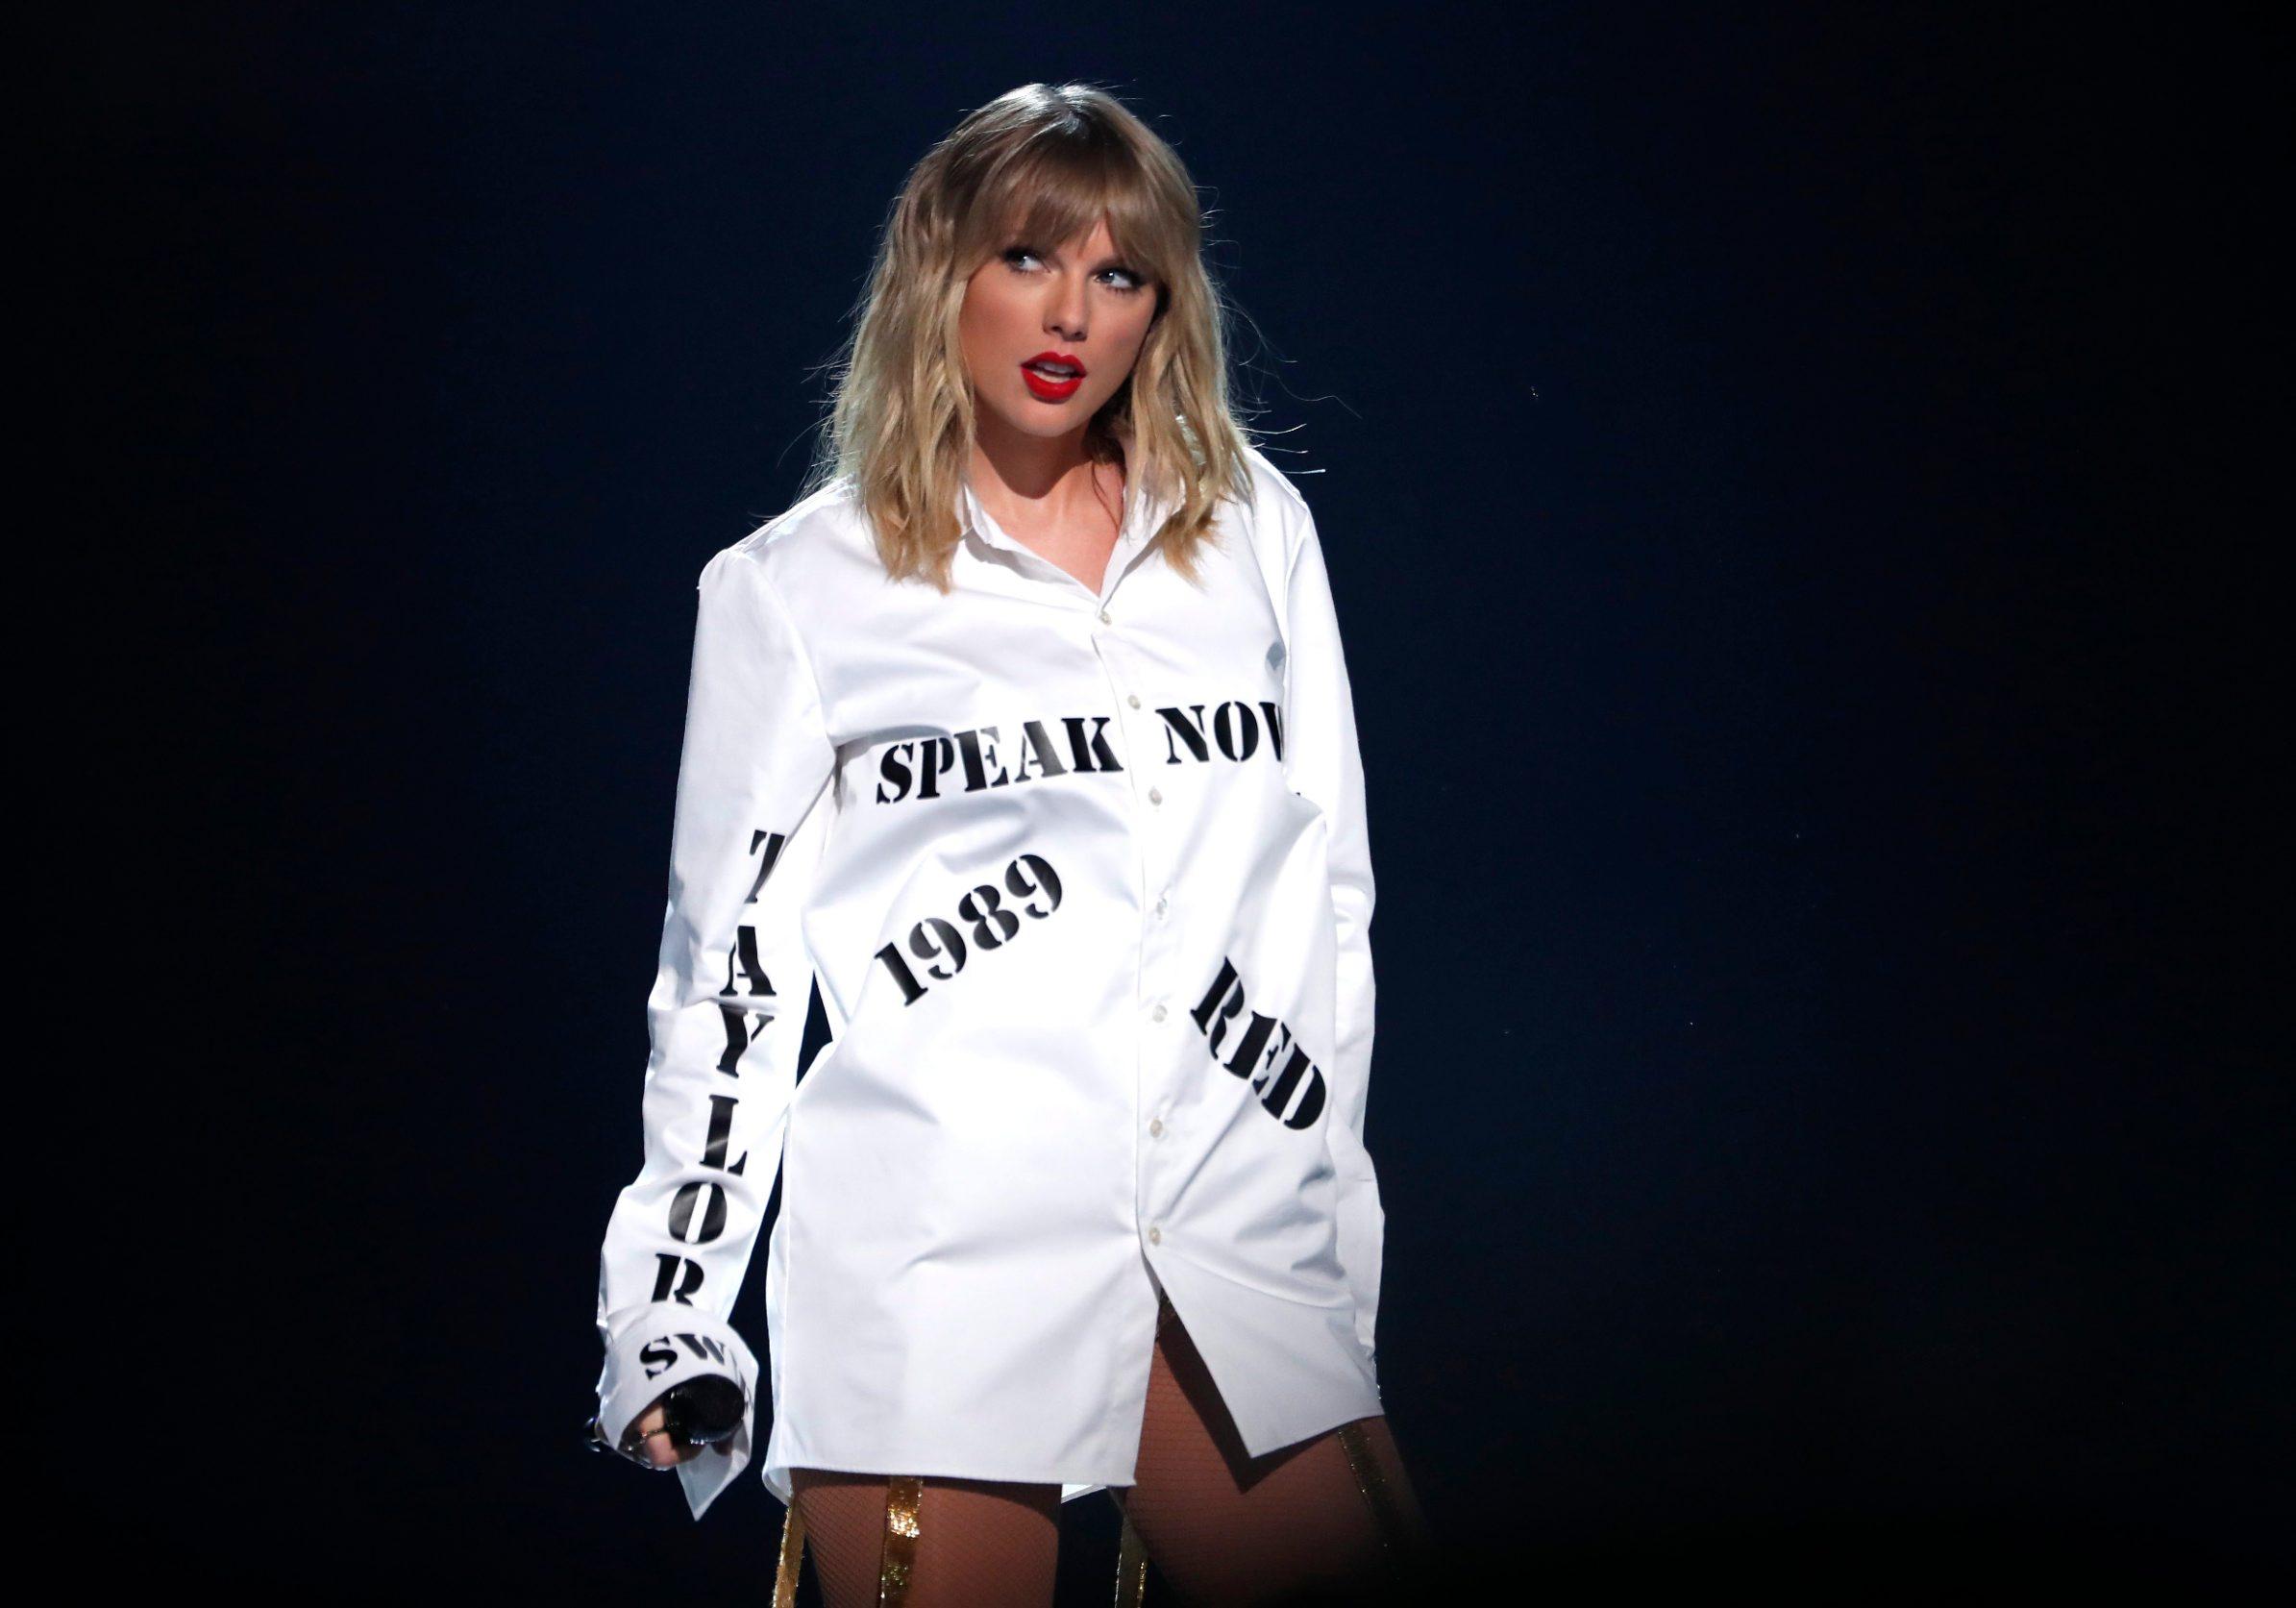 2019 American Music Awards - Show - Los Angeles, California, U.S., November 24, 2019 - Taylor Swift performs a medley. REUTERS/Mario Anzuoni